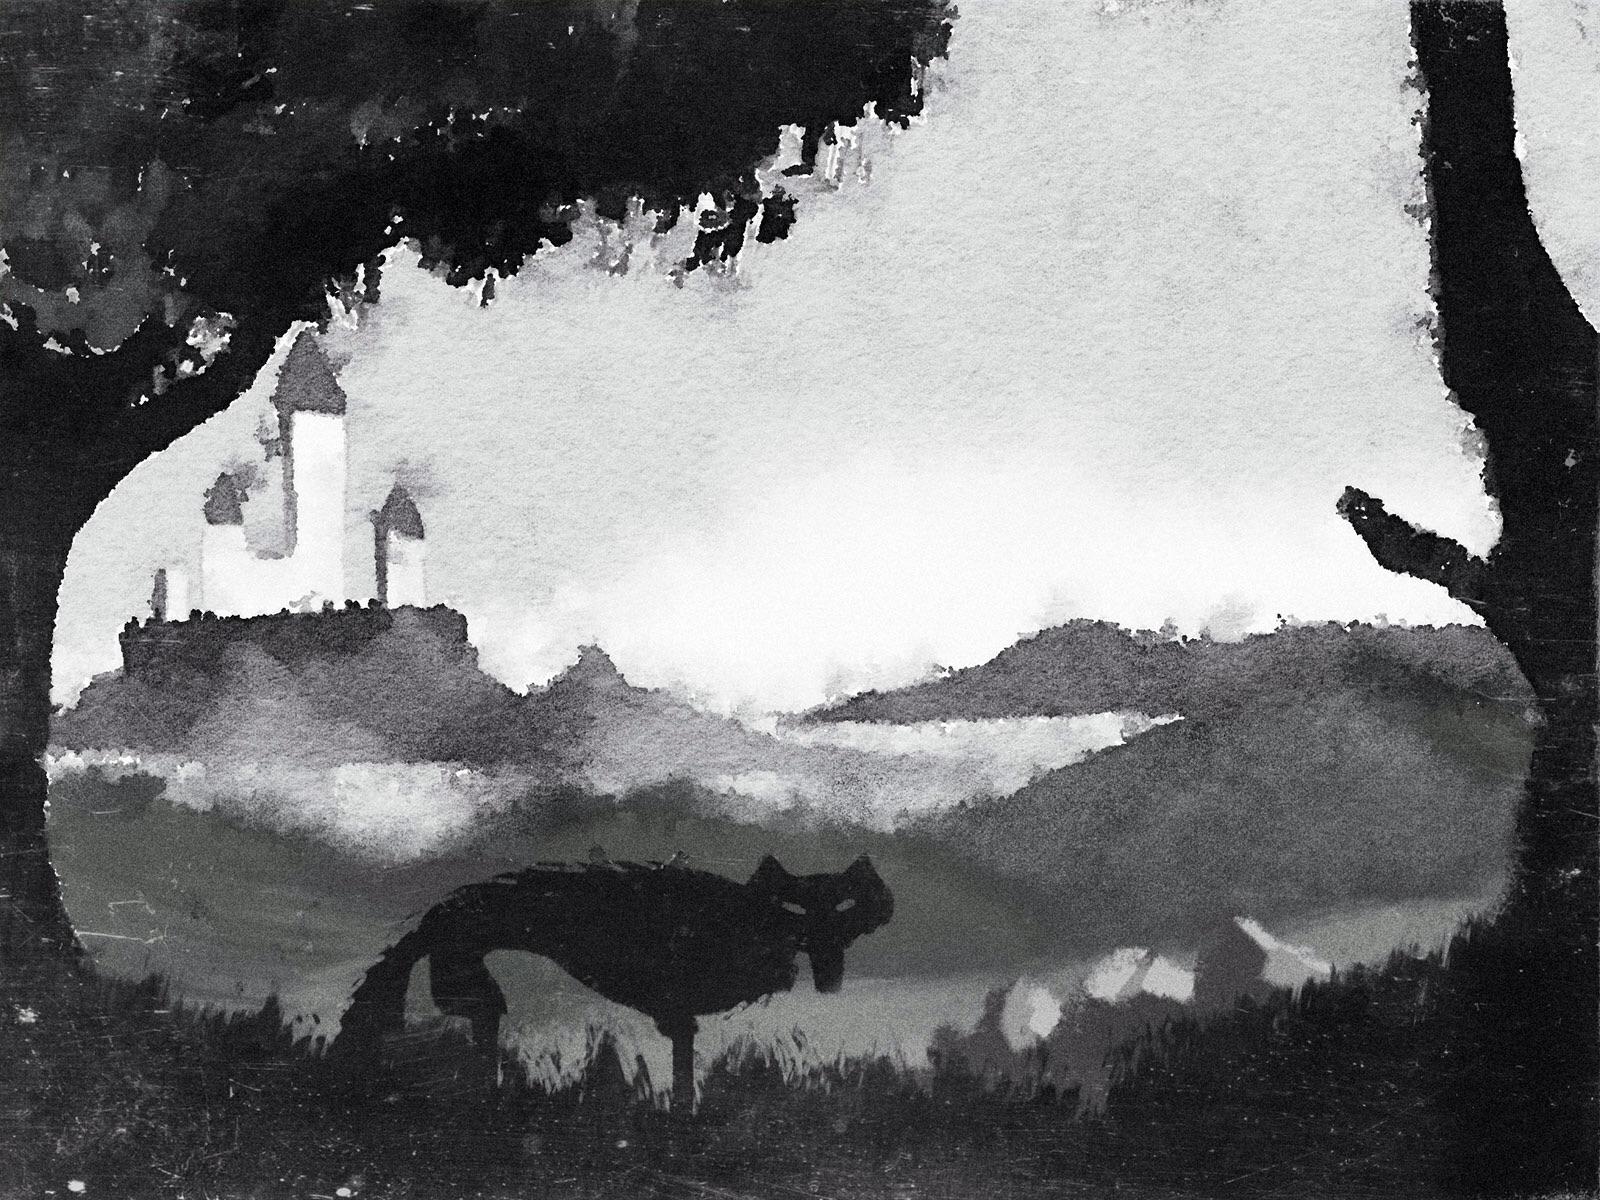 Concept artwork.